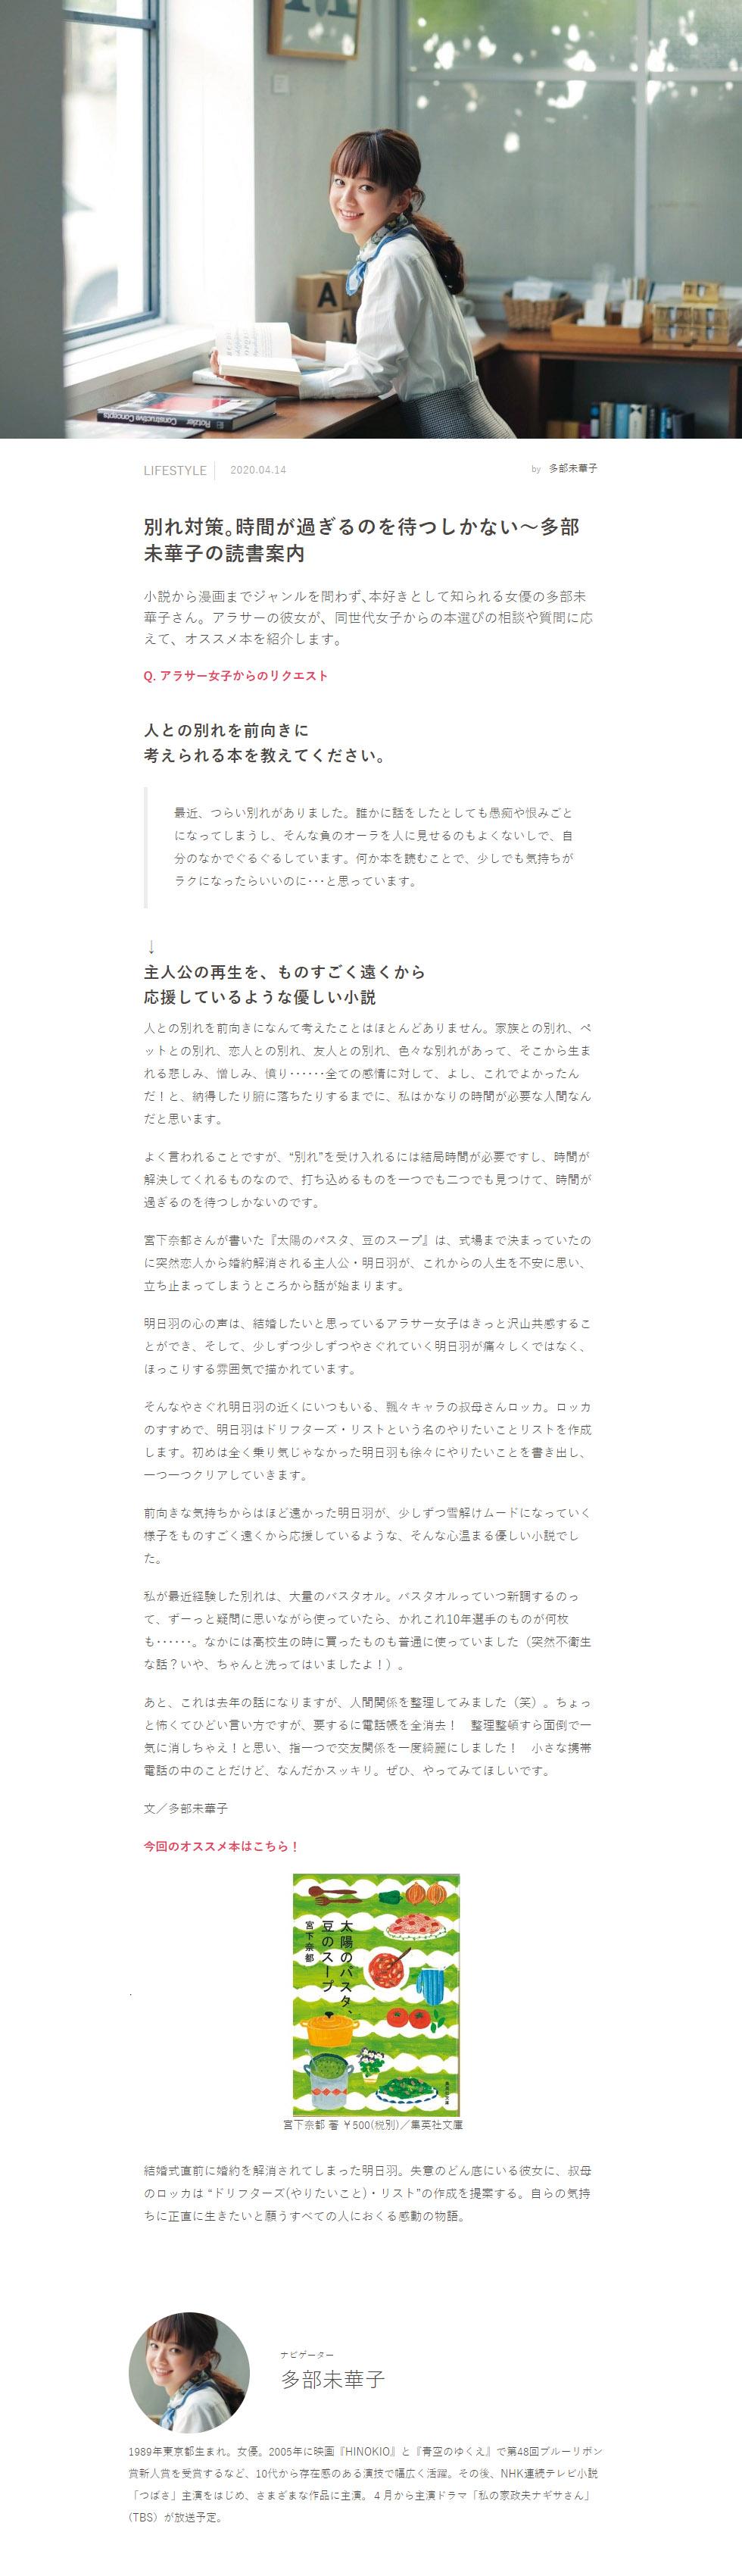 gingerweb 多部未華子260